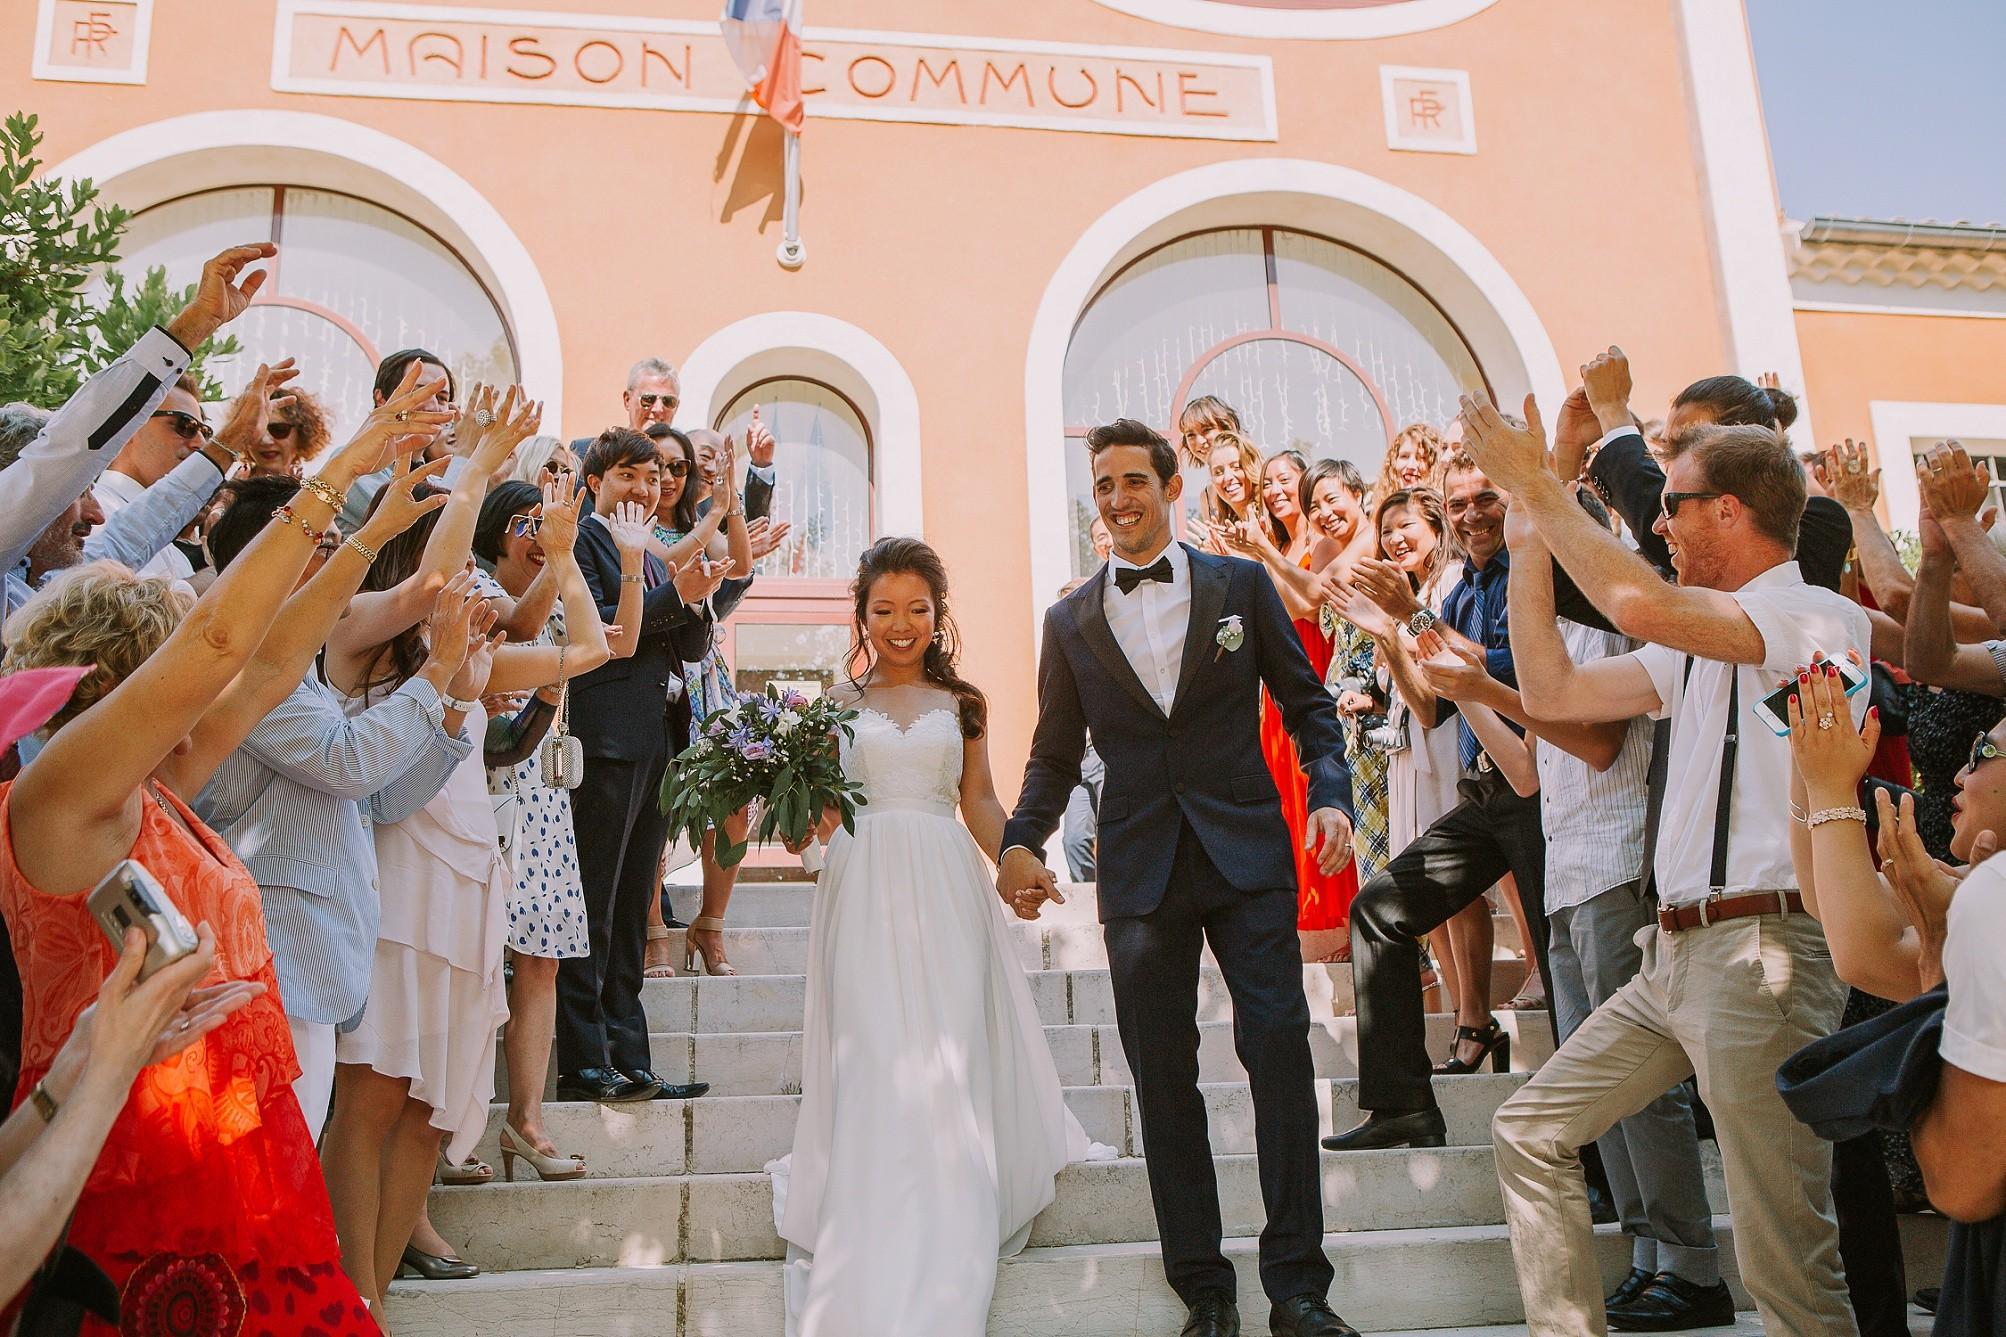 katerynaphotos-mariage-photographe-puyloubier-provence-aix-en-provence-sud-de-la-france_0373.jpg